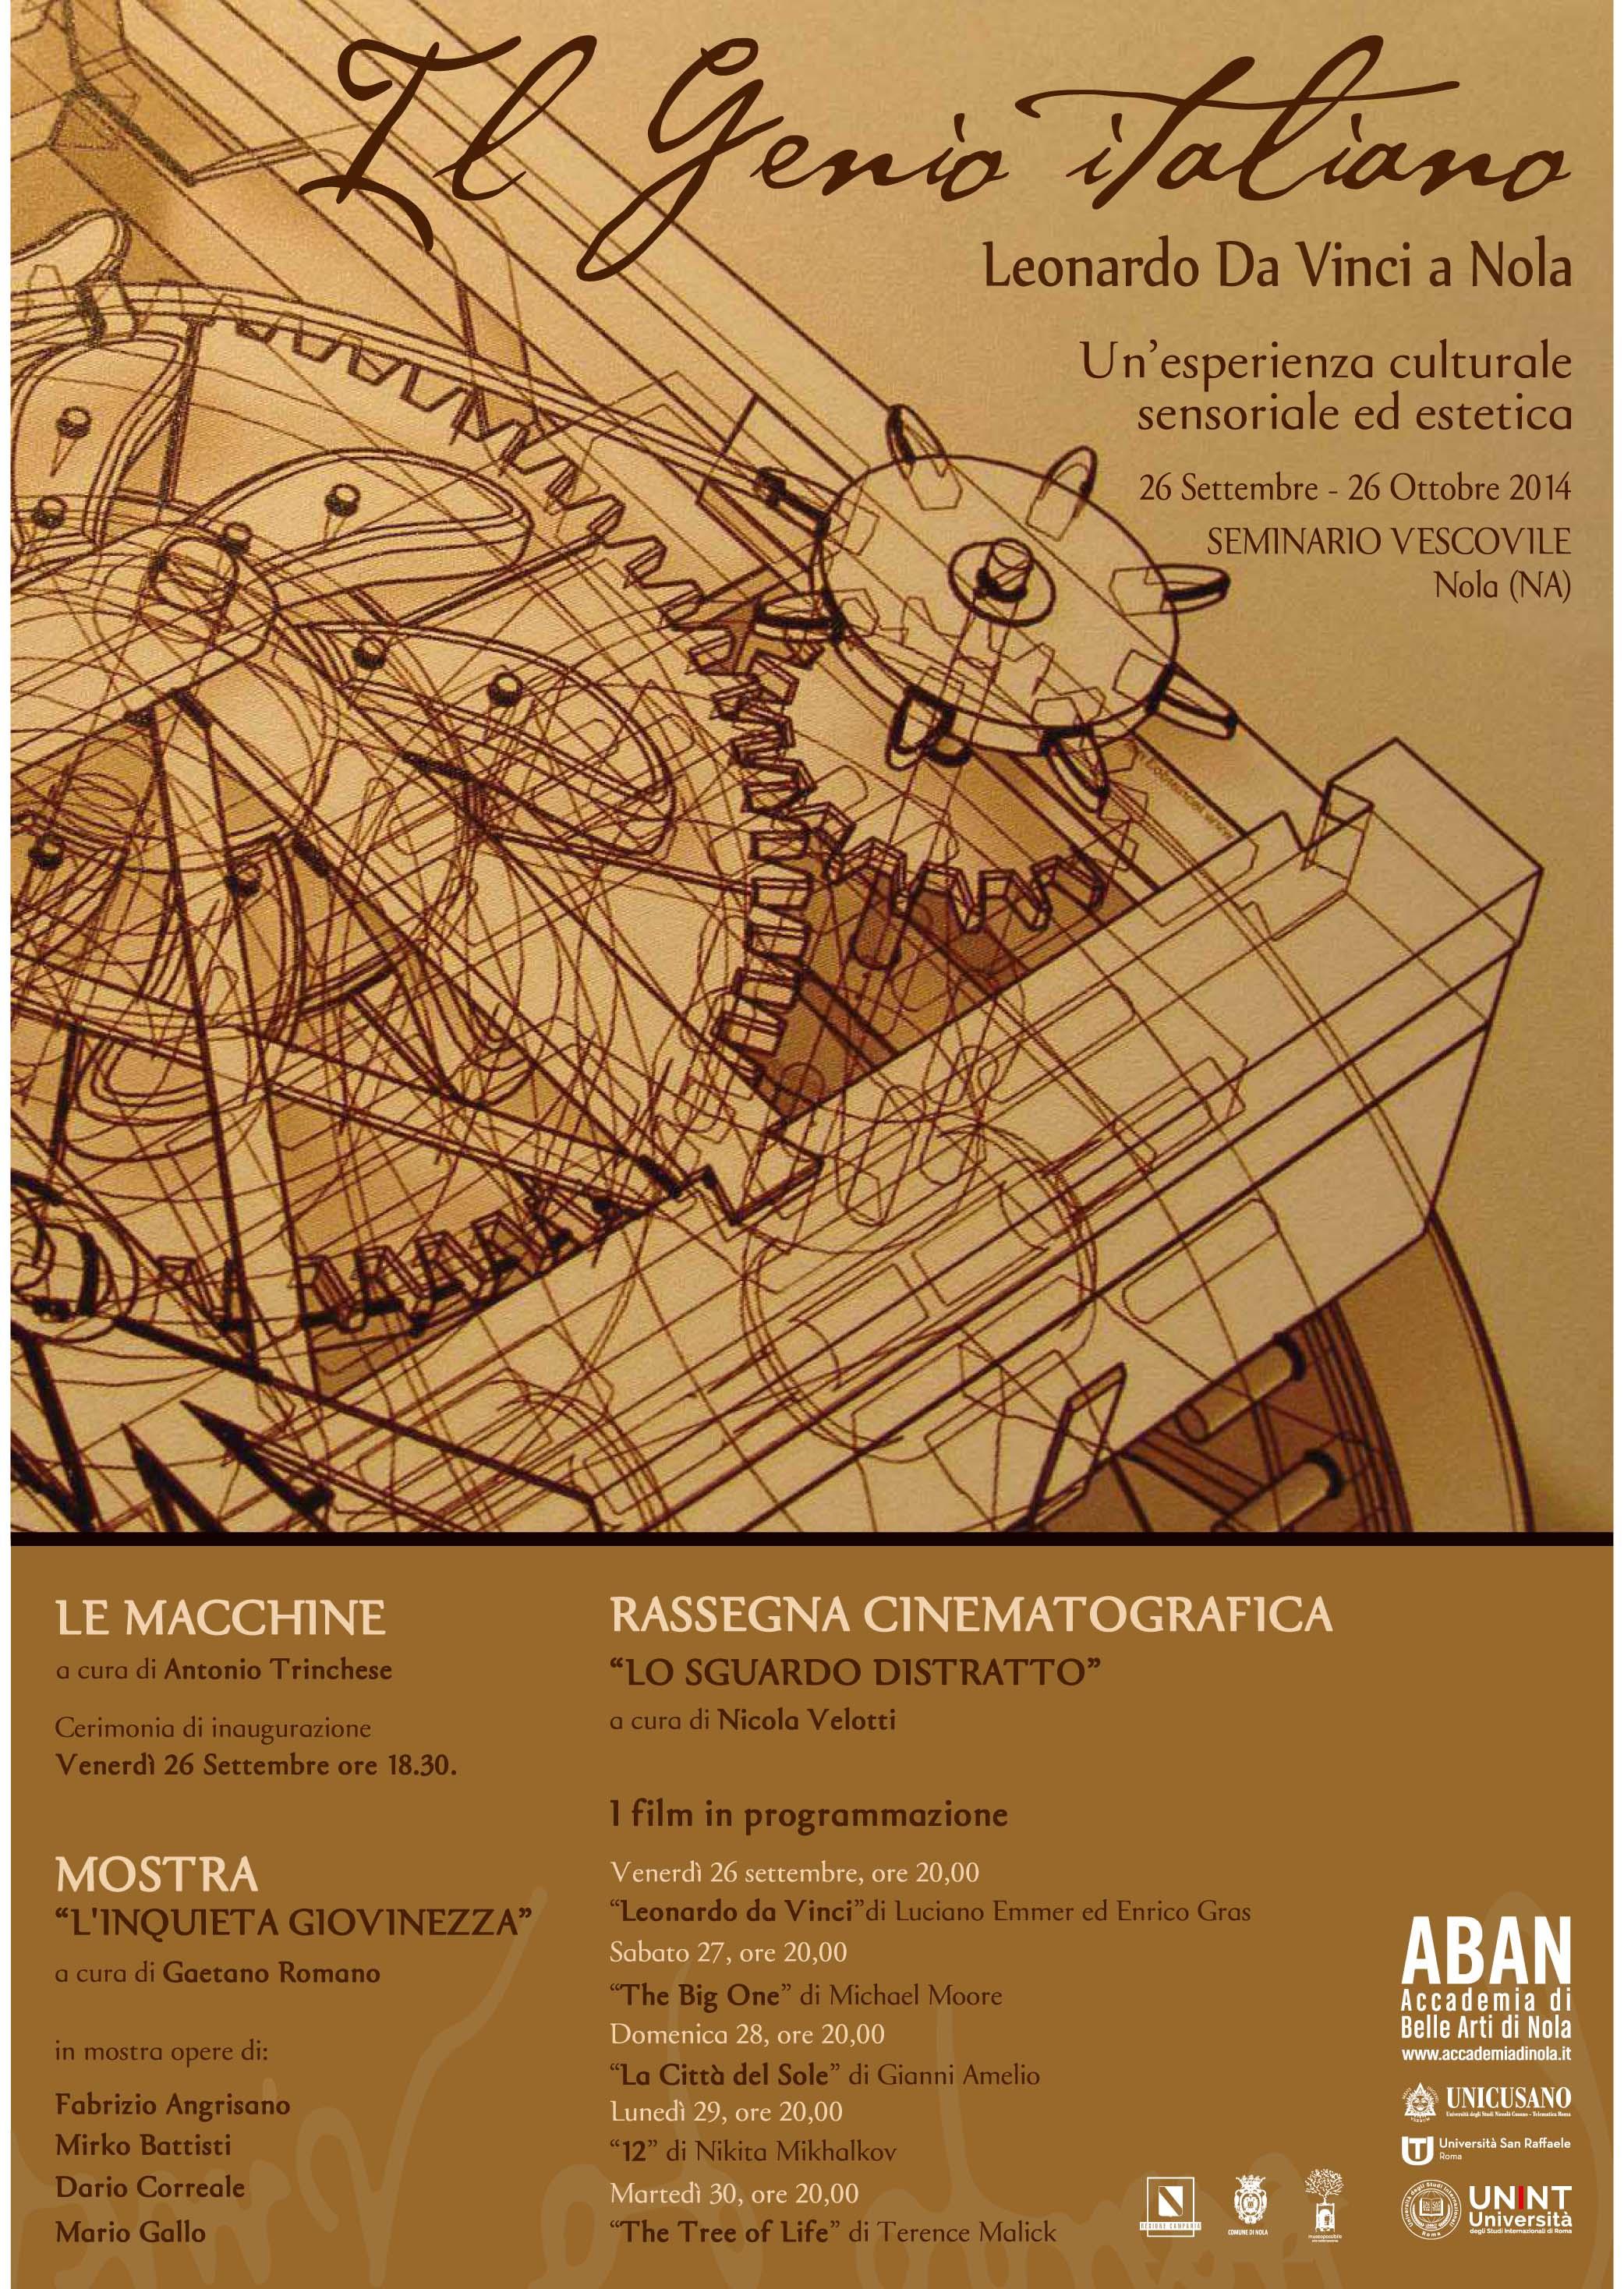 A Nola, una mostra dedicata al Genio Italiano, Leonardo Da Vinci